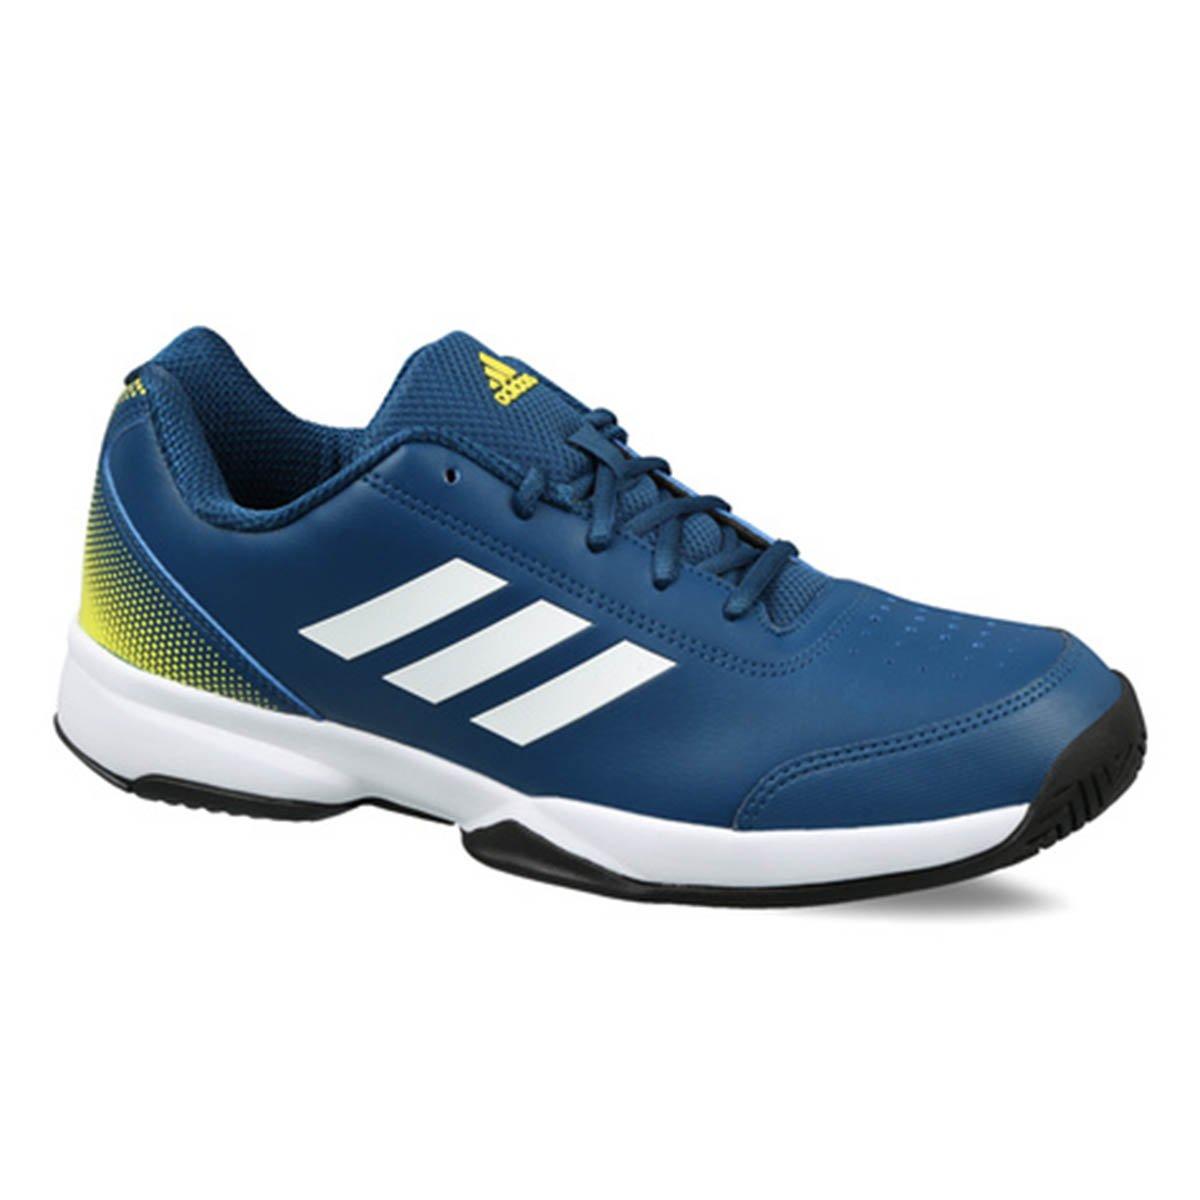 Adidas Squash Shoes Buyer's Guide Squash Source